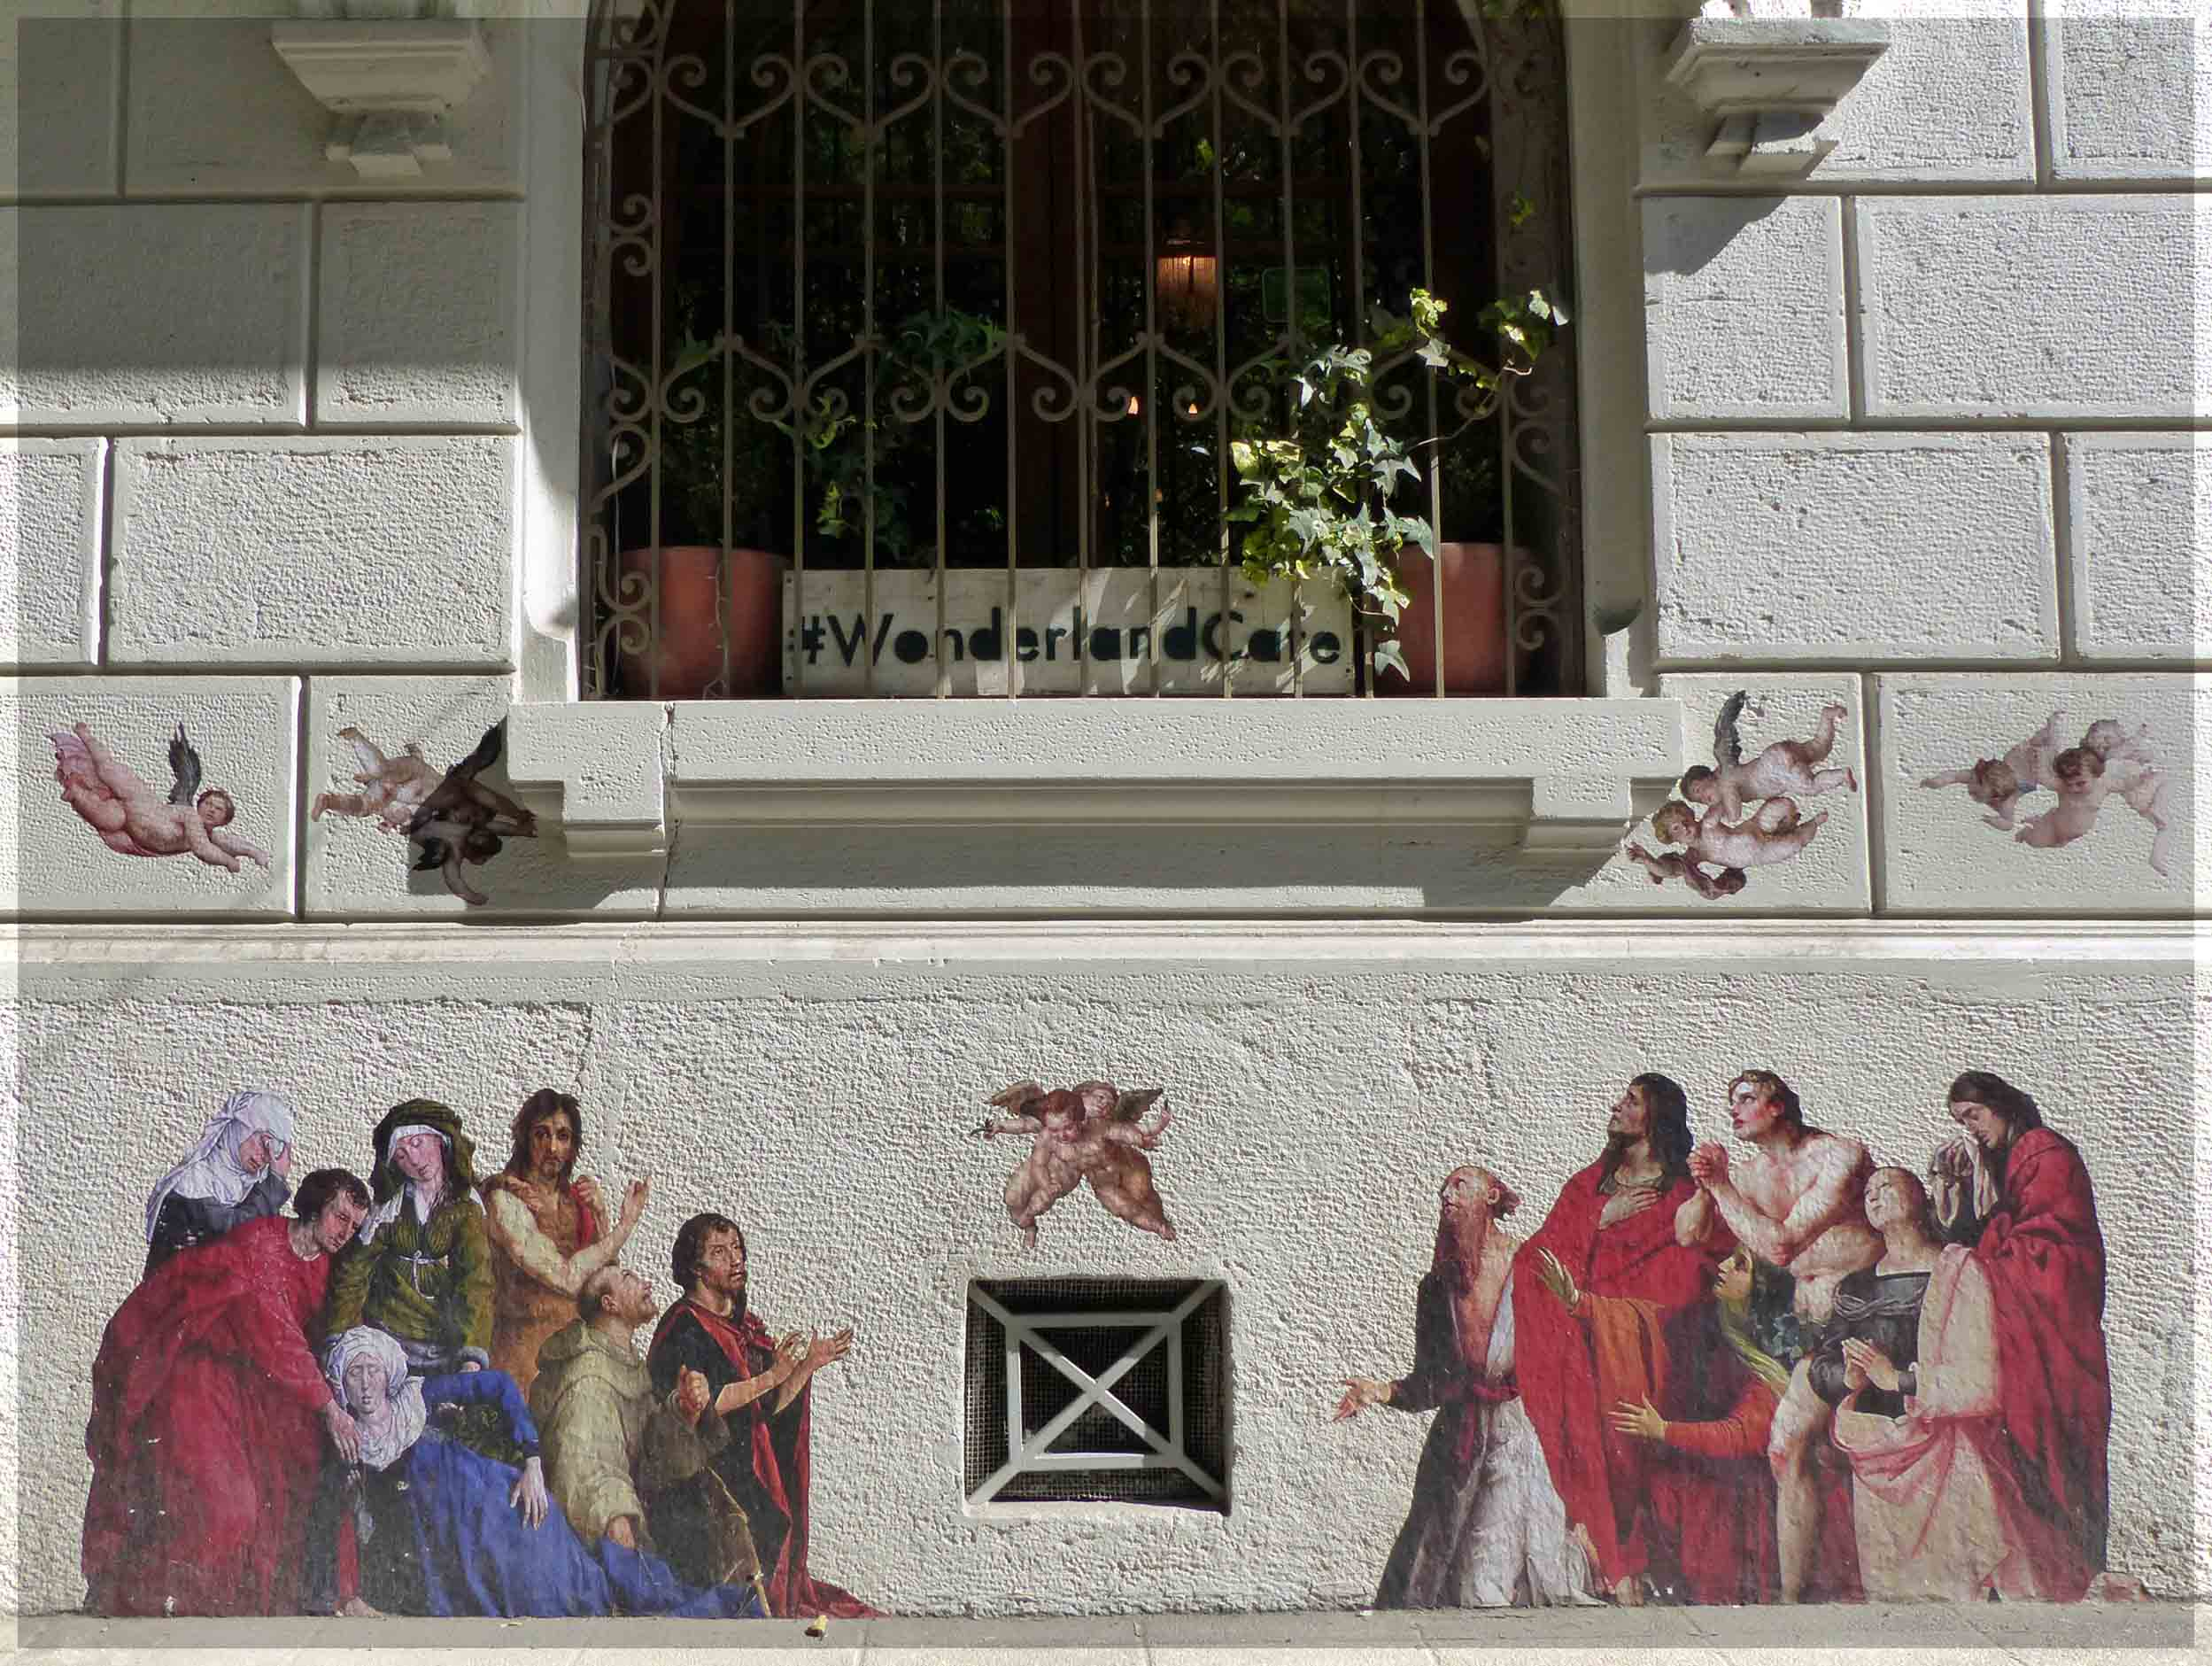 Mural of a Biblical scene with cherubs